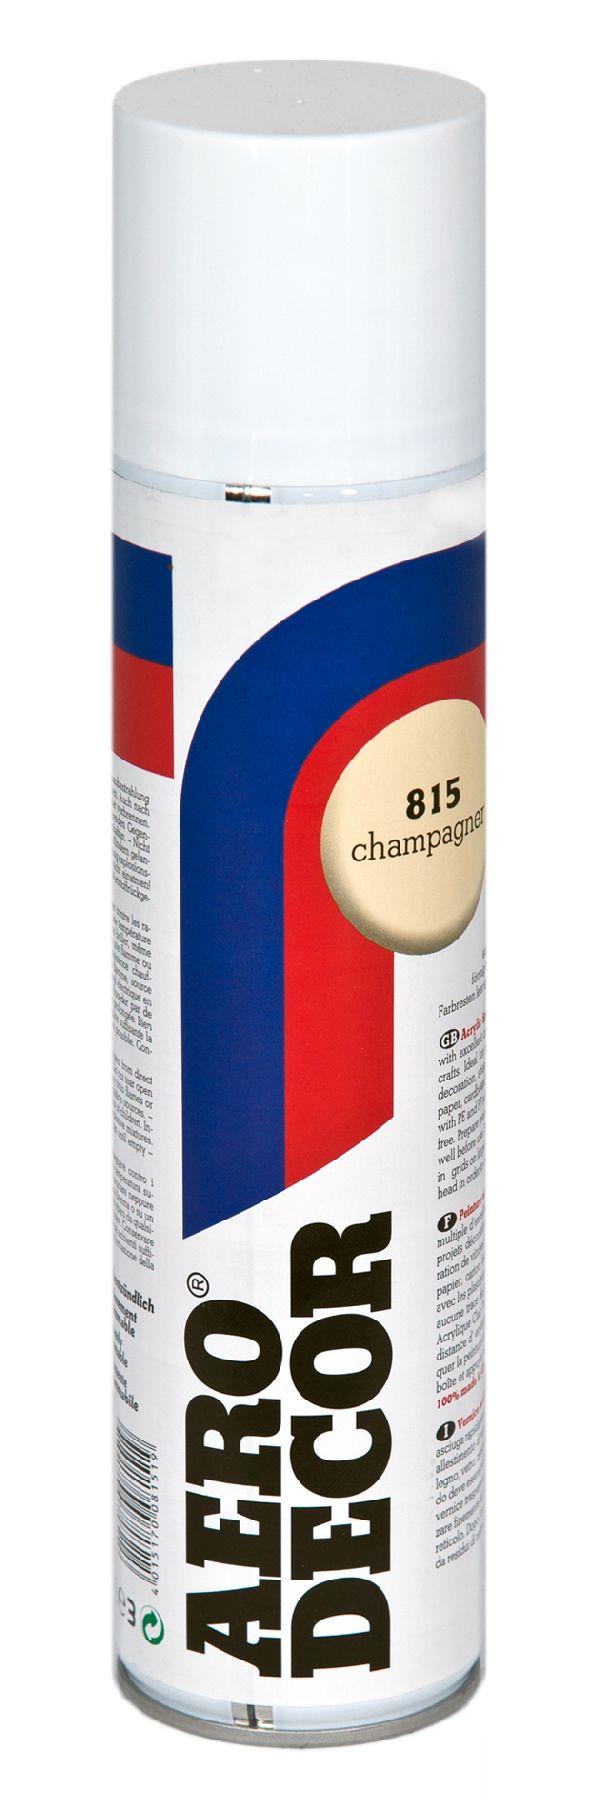 Colorspray, Farbspray CHAMPAGNER (creme) 815 400 ml